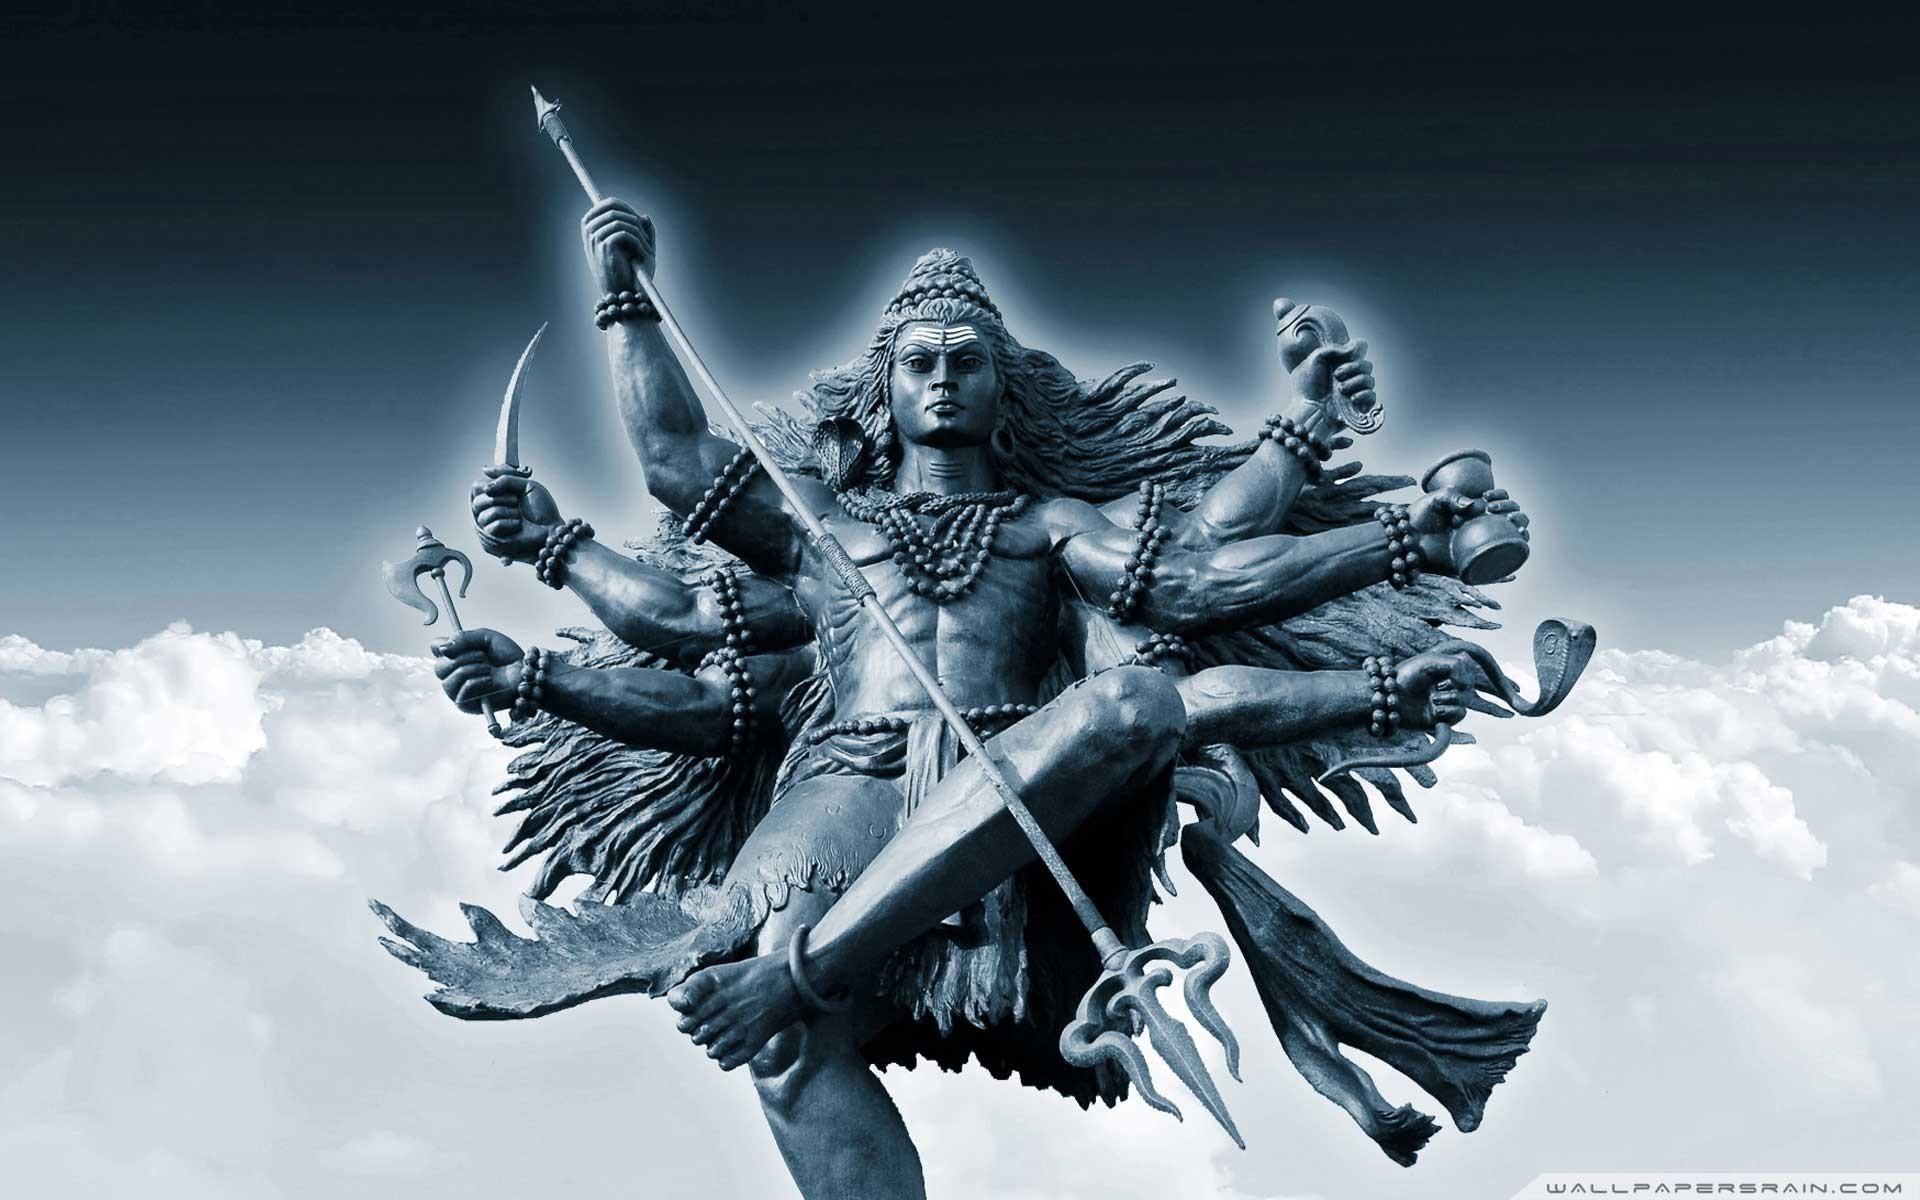 Shiva Smoking Chillum Hd Wallpaper Shiv Photo Wallpapers 66 Images